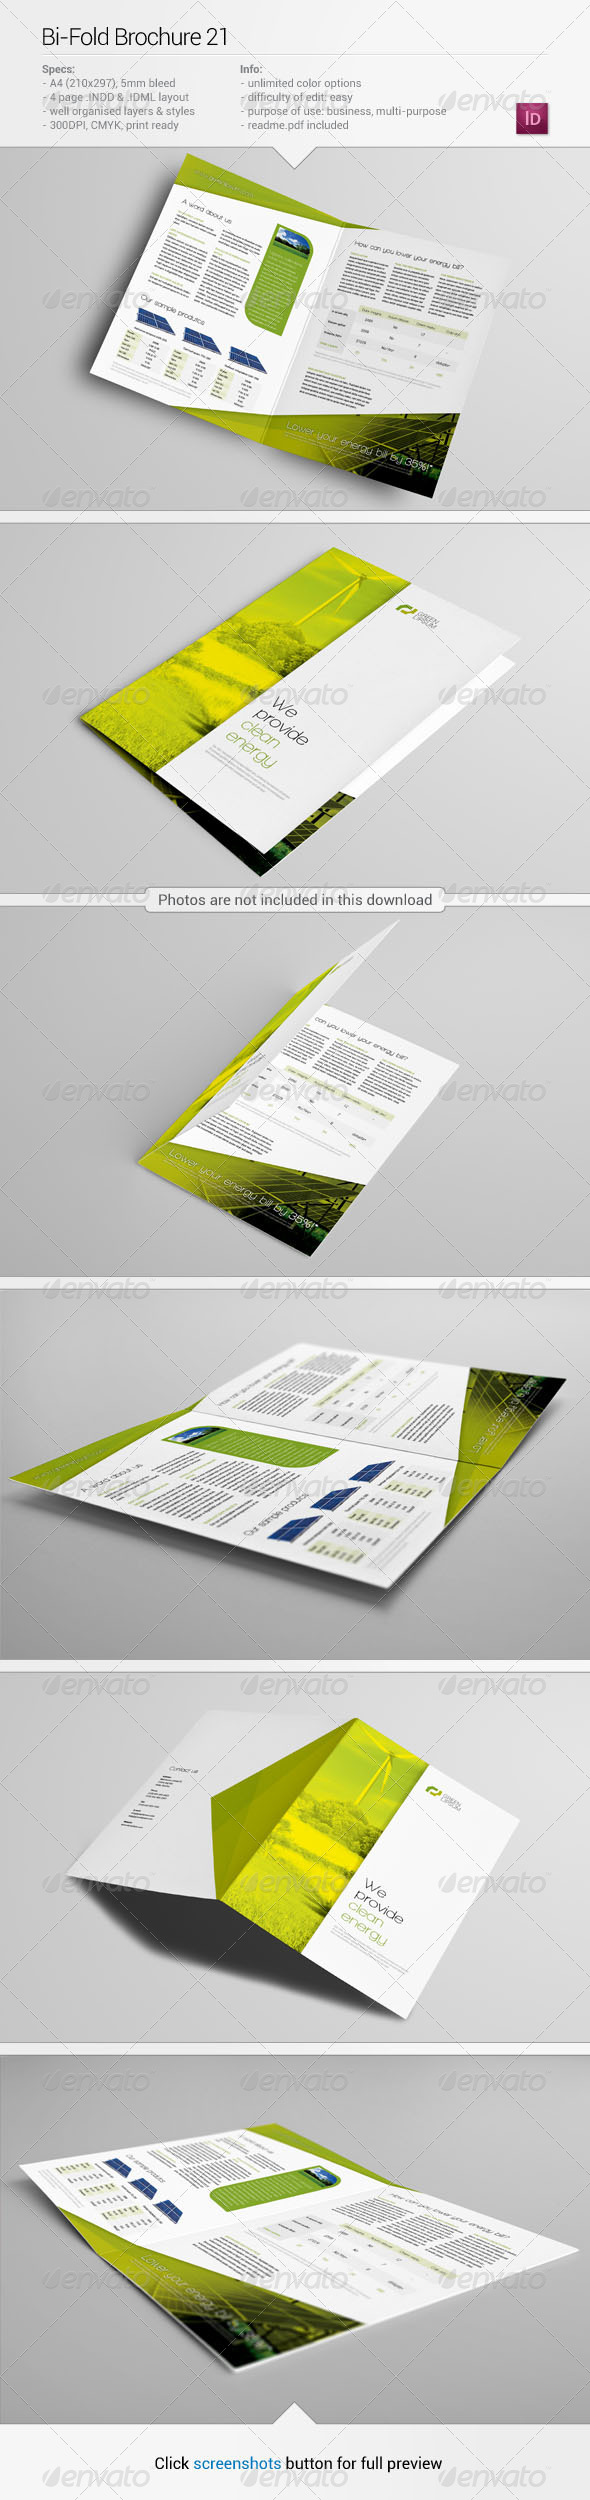 GraphicRiver Bi-Fold Brochure 21 5688990